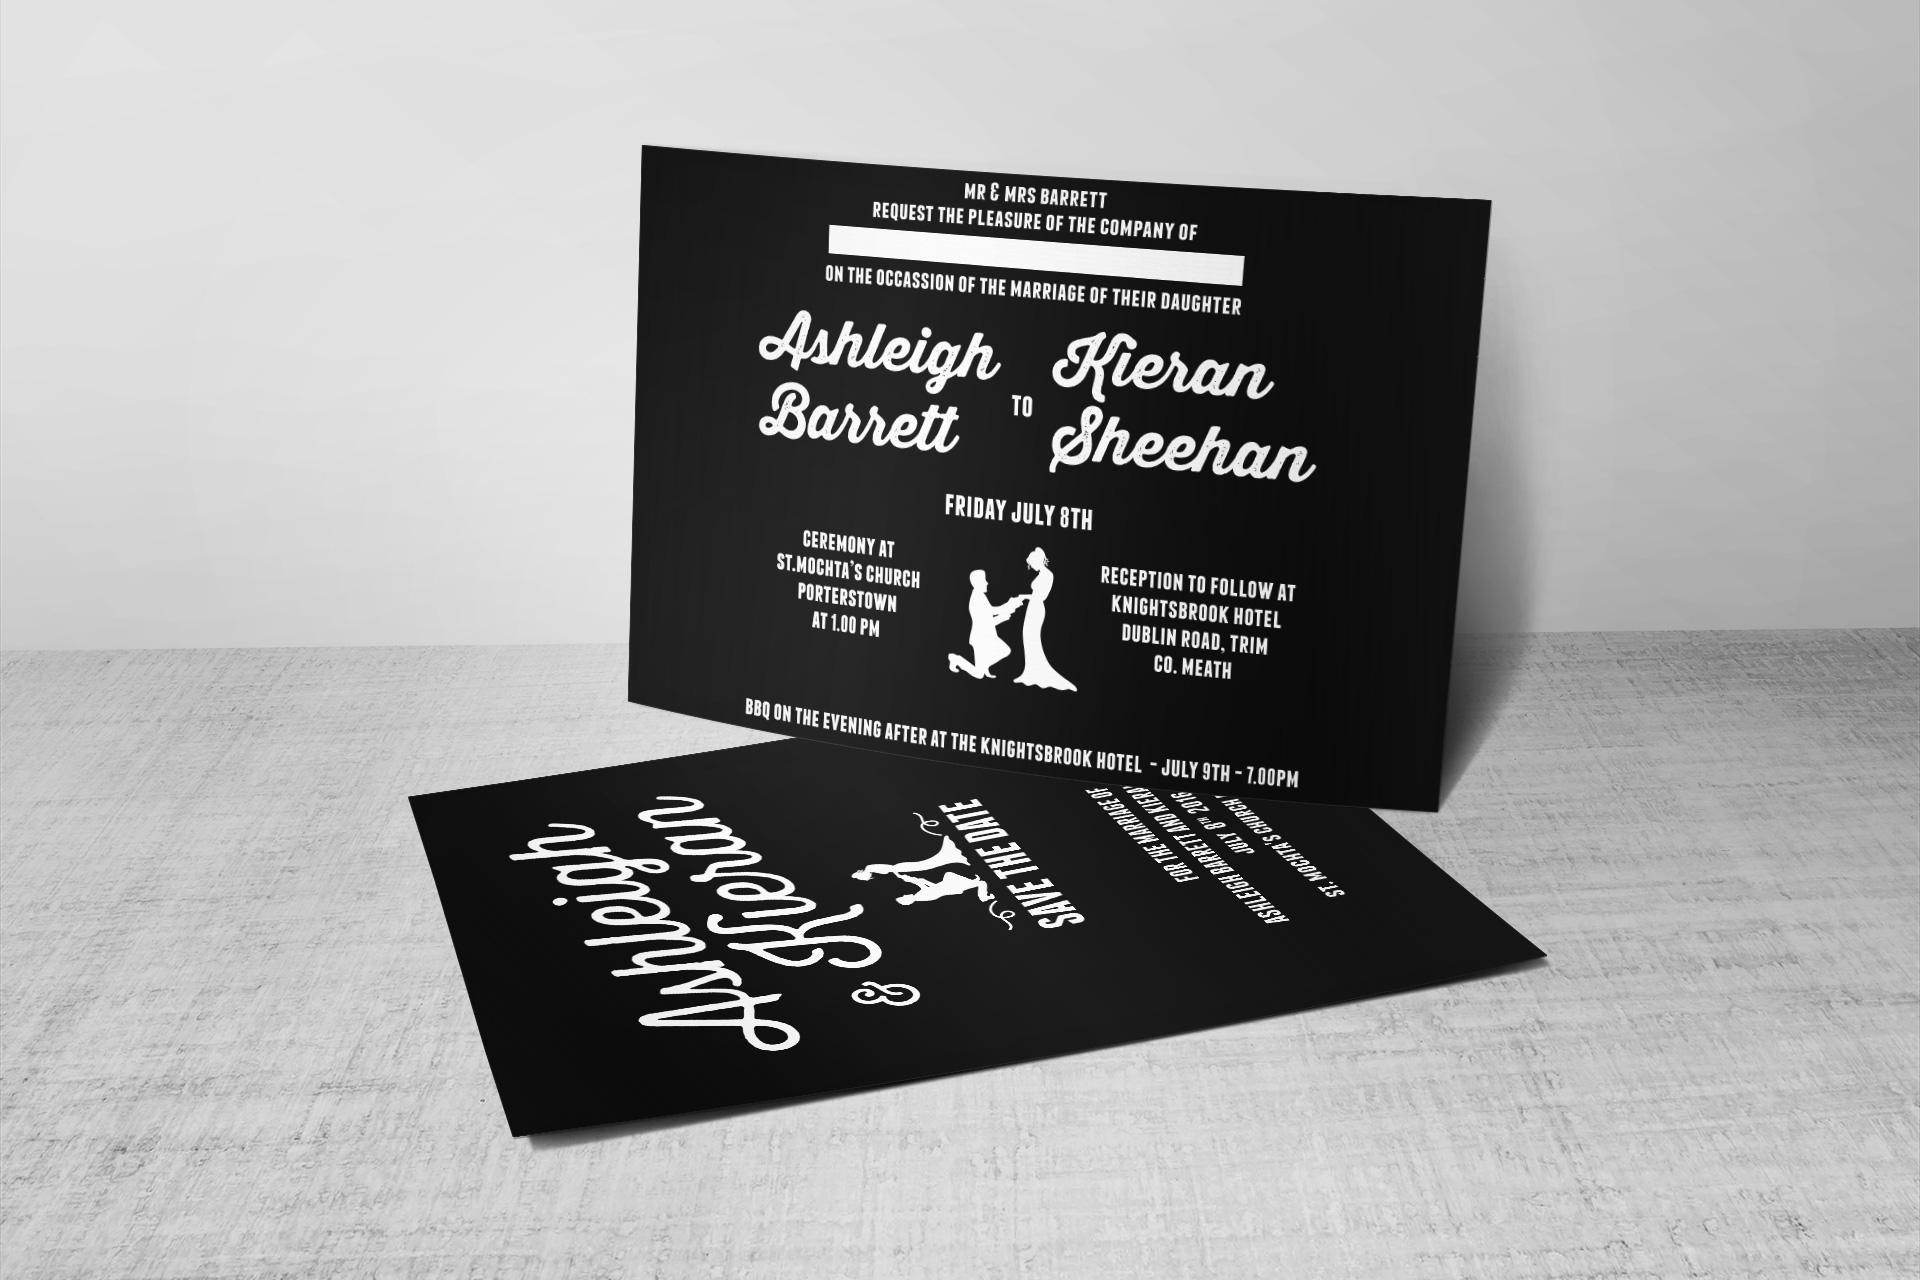 Freelance Web Designer. Graphic Designer - Beep Designs